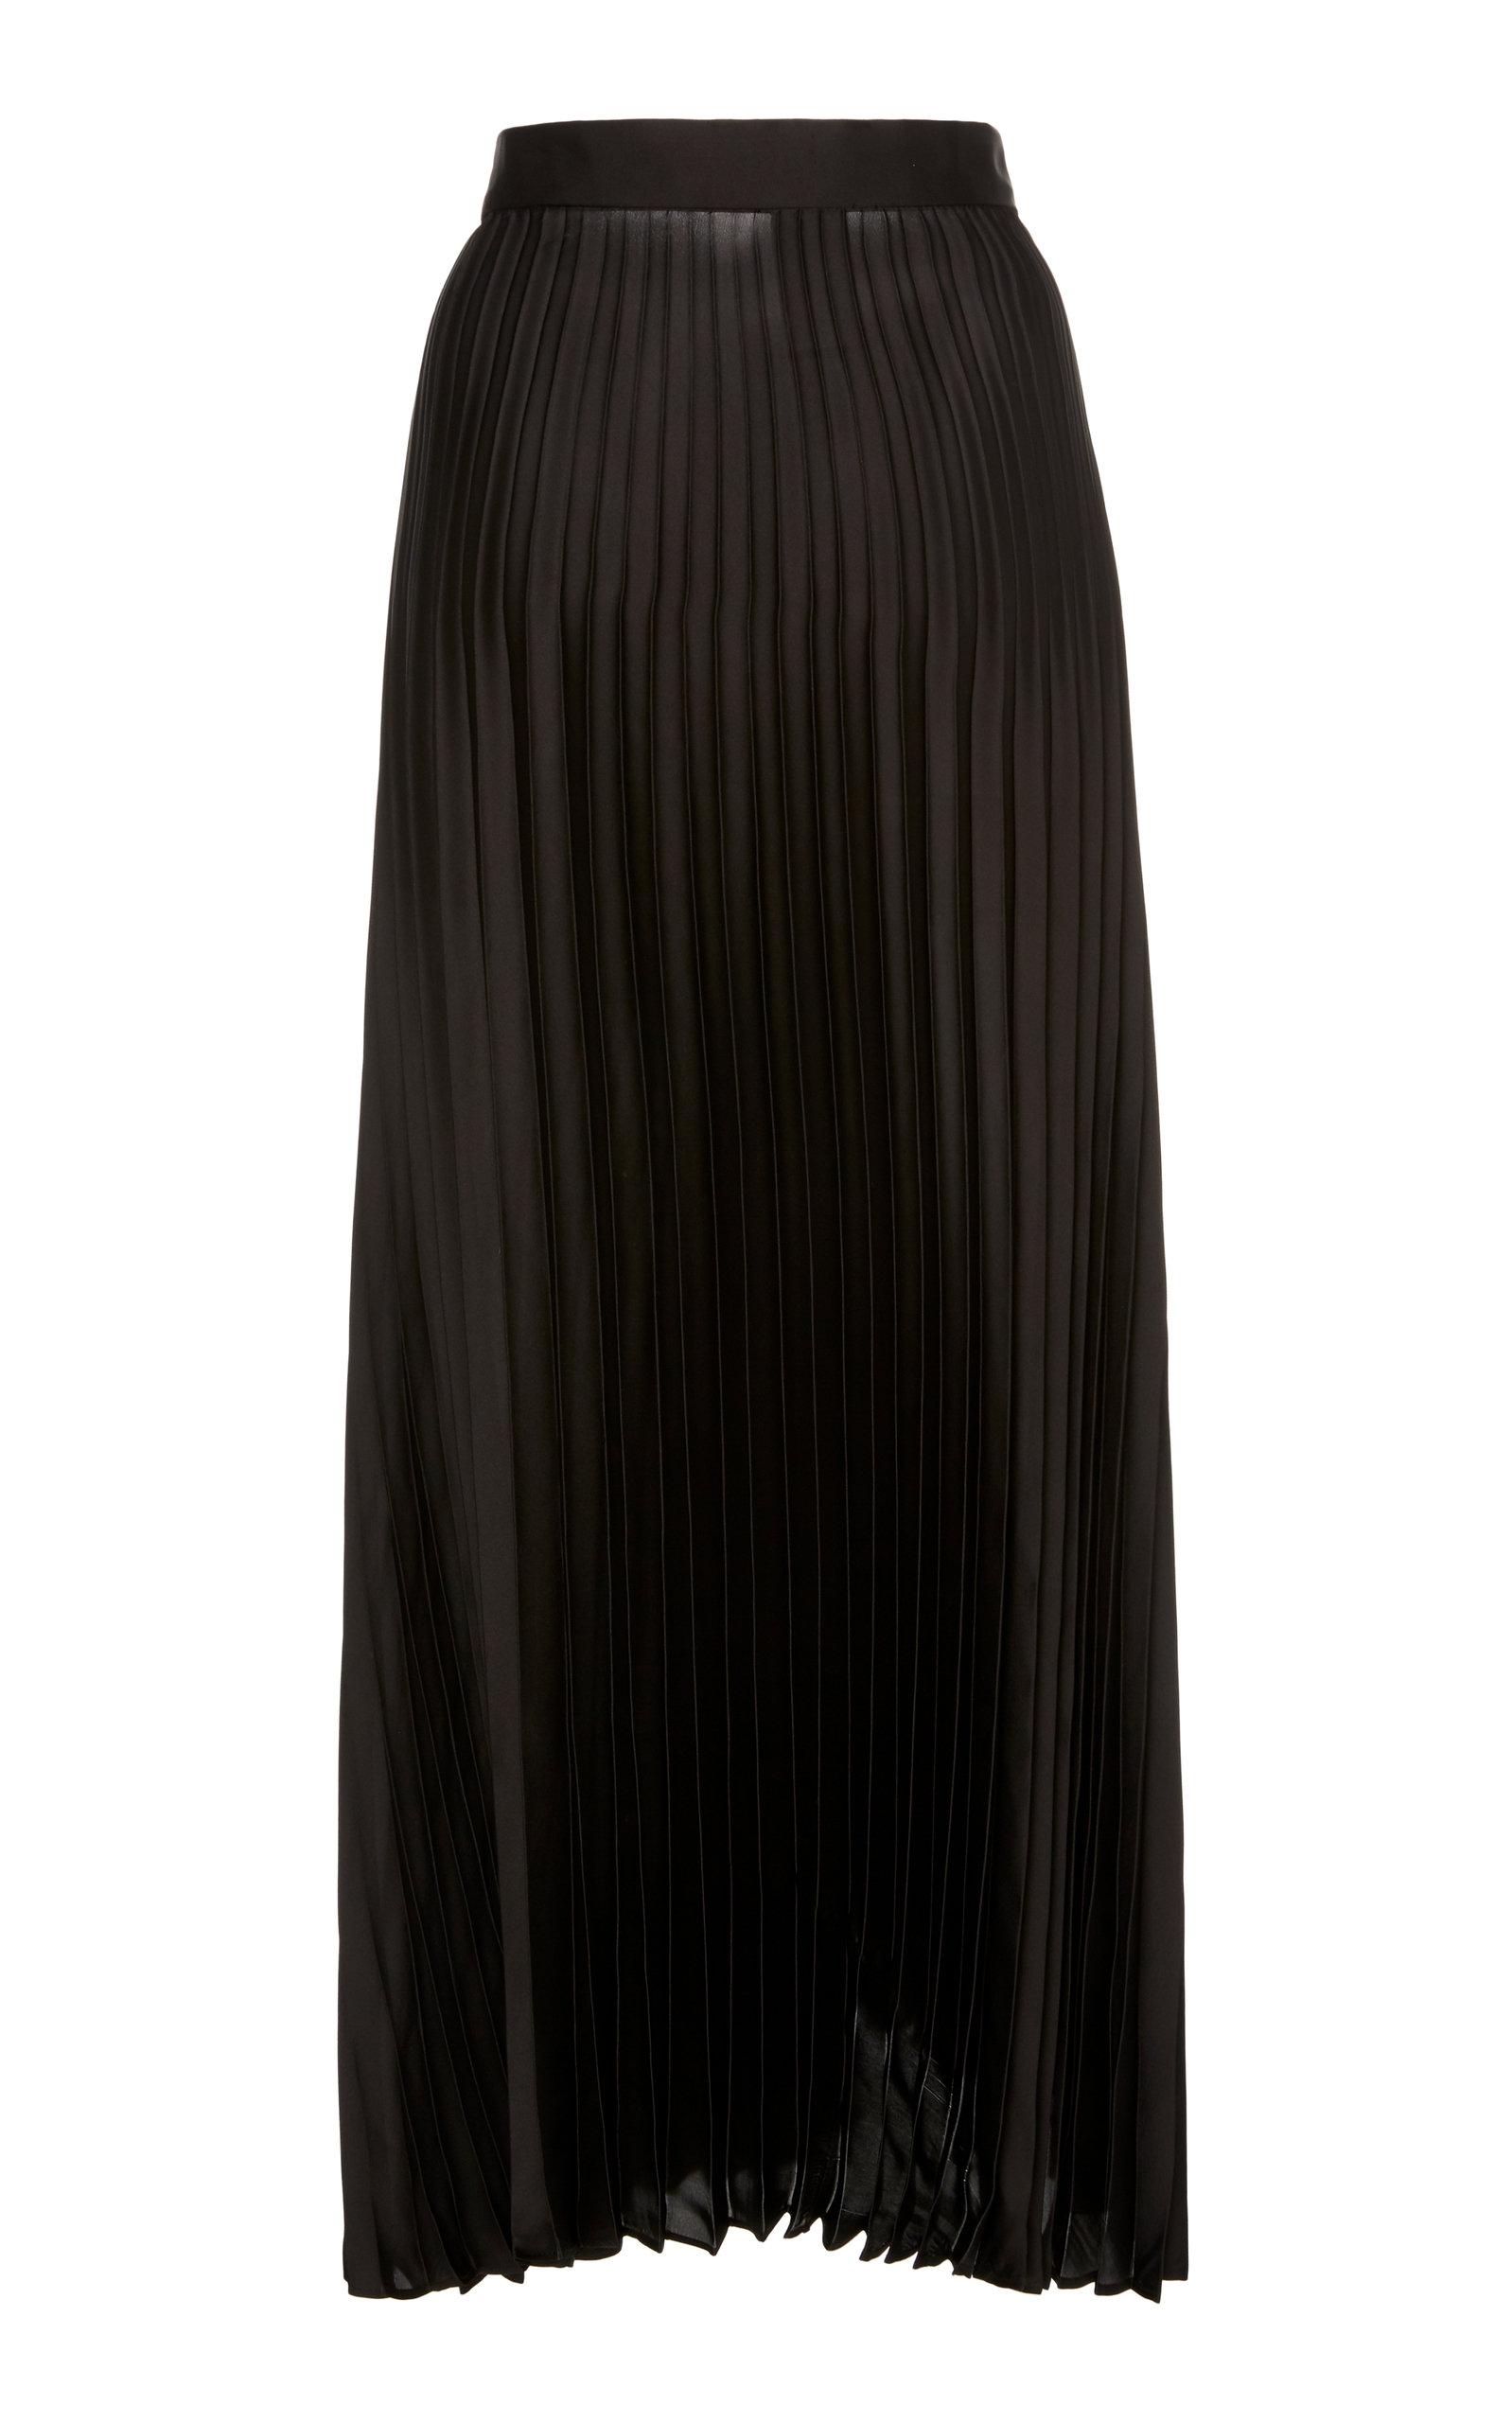 1c50f28e57 Brunello CucinelliBelted Pleated Satin Maxi Skirt. CLOSE. Loading. Loading